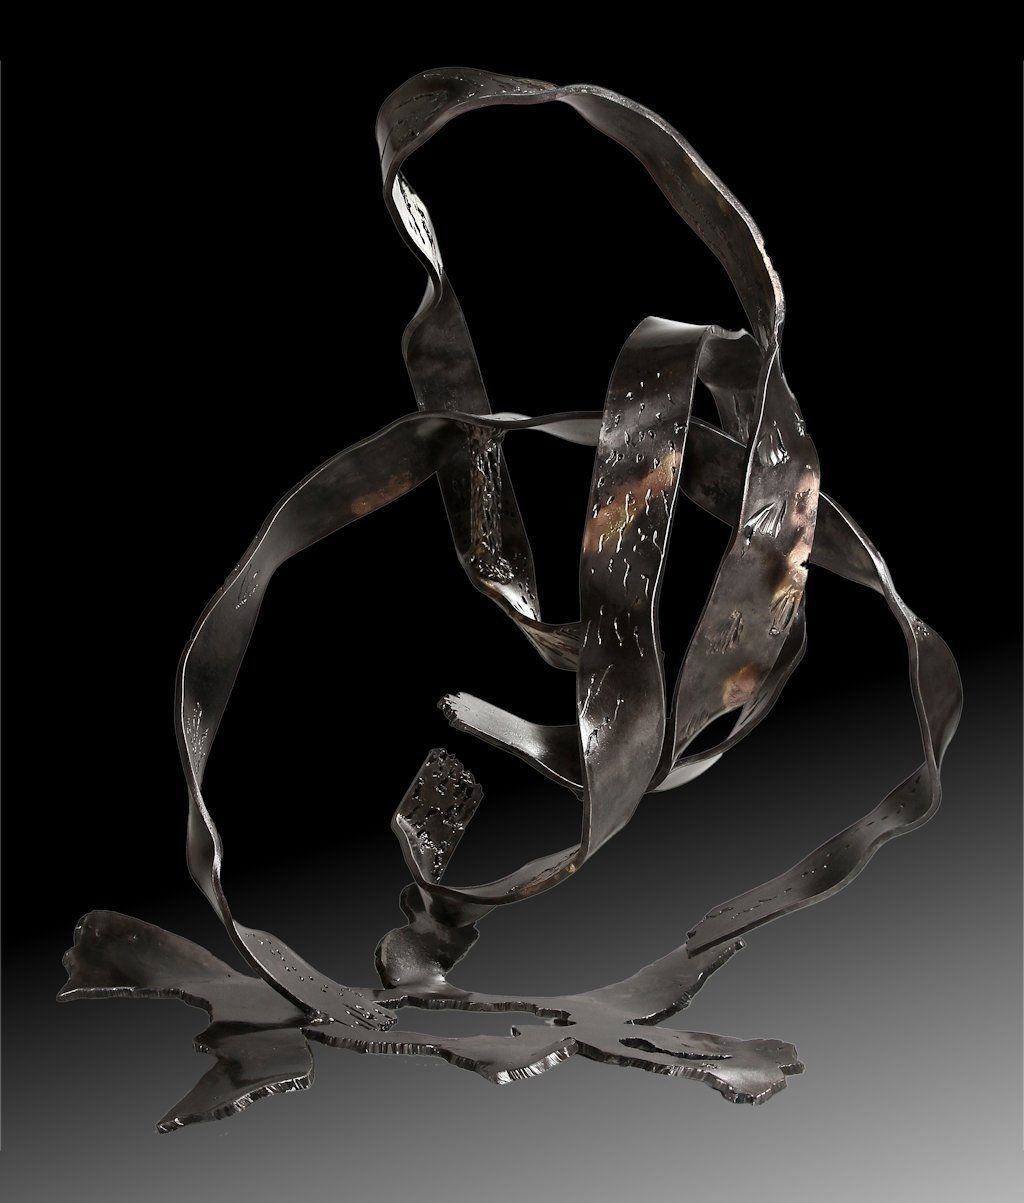 No title | 2014 | Iron & brass | 90x70x70 cm | Rami Ater